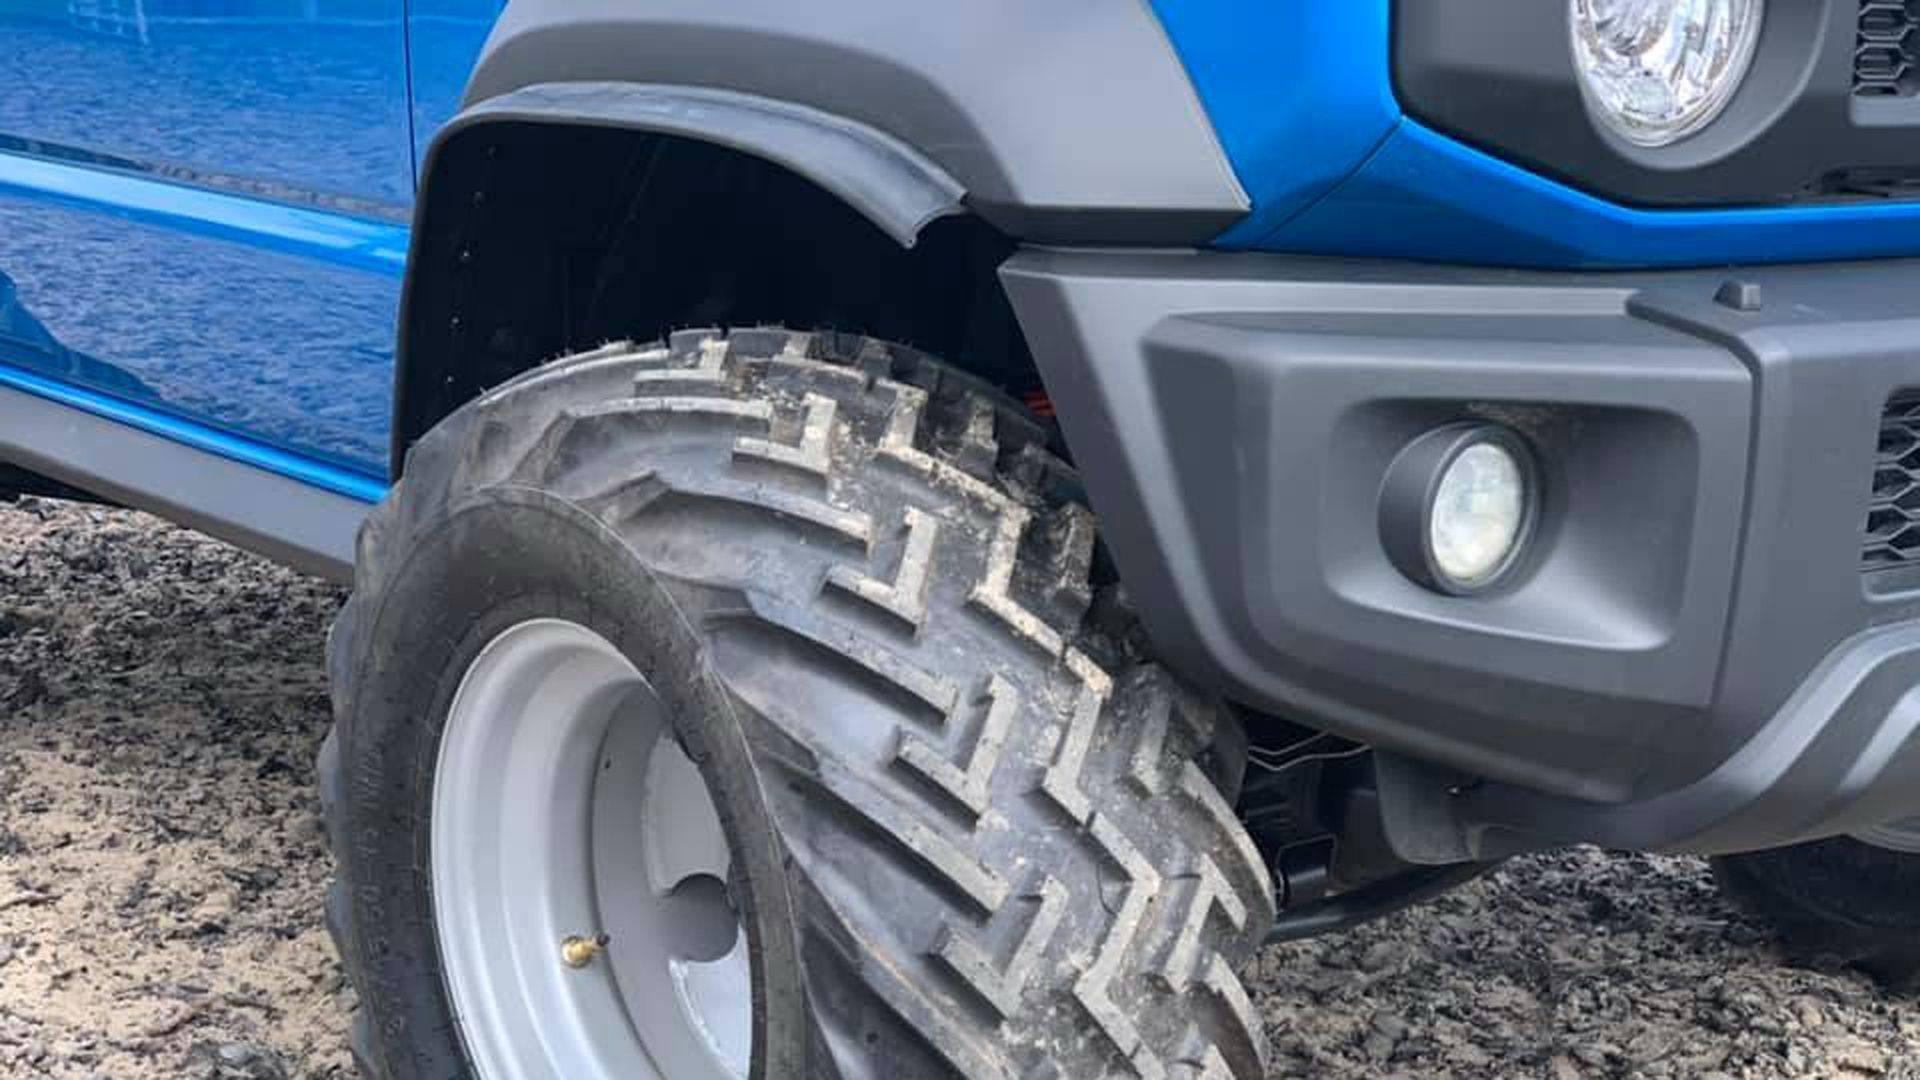 Suzuki_Jimny_pickup_0006